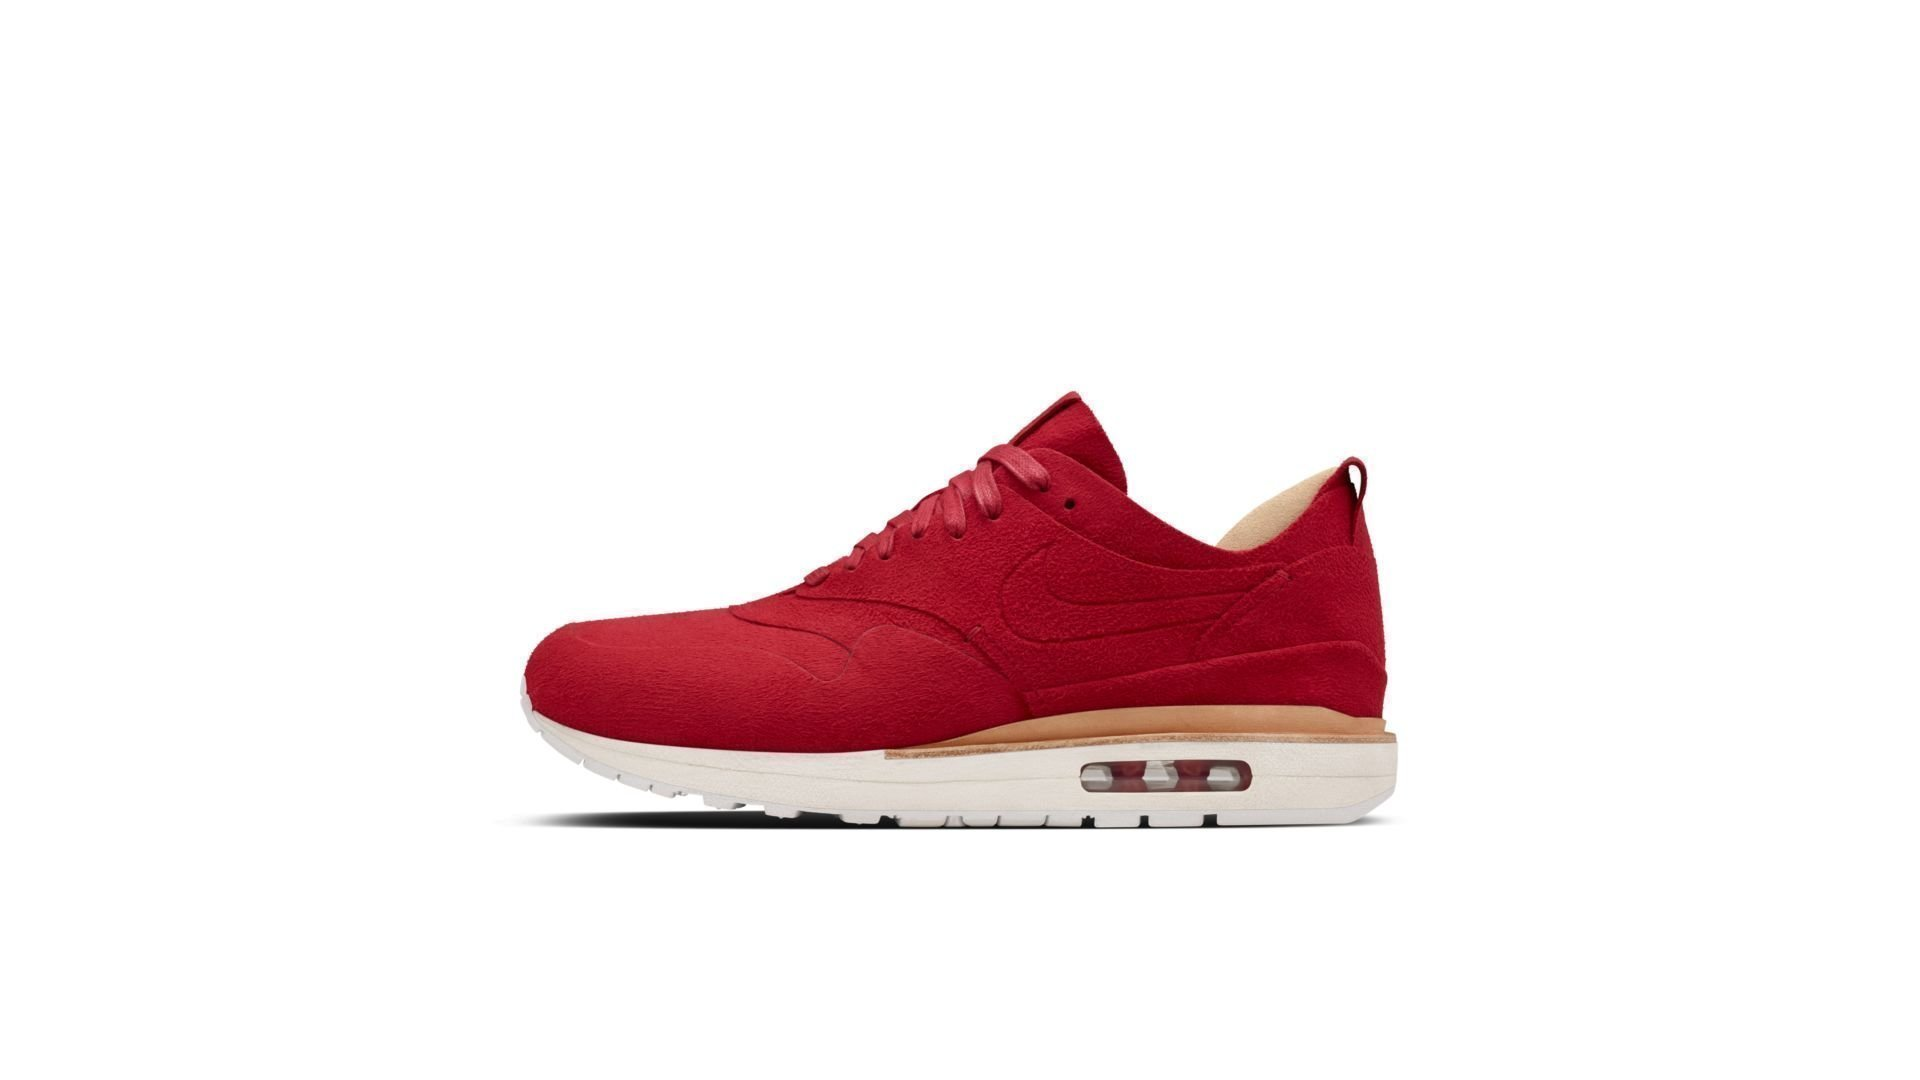 Nike Air Max 1 Royal Gym Red (847671 661)